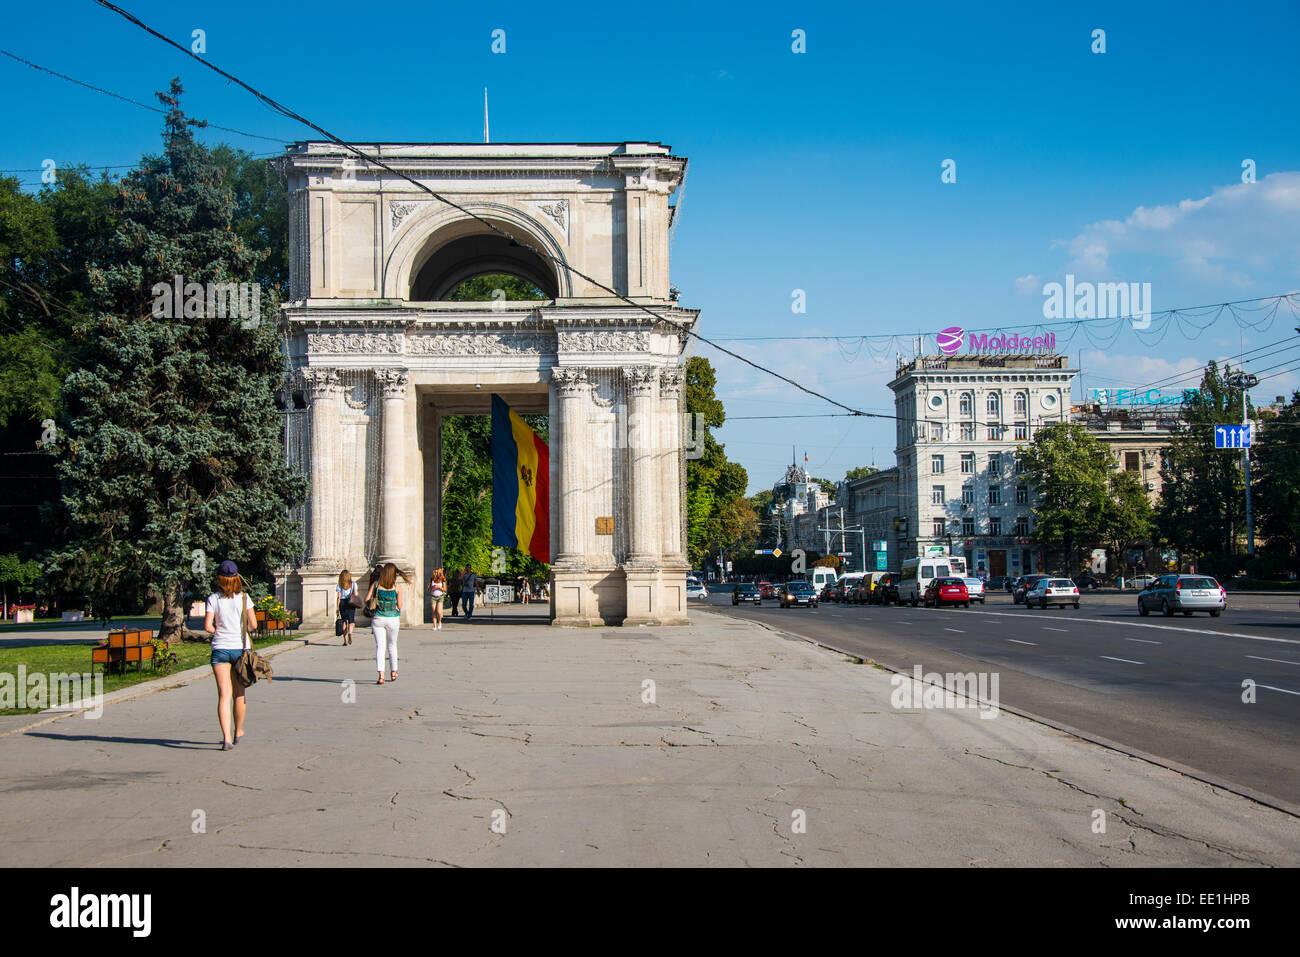 Arc de Triomphe in the center of Chisinau, Moldova, Europe - Stock Image